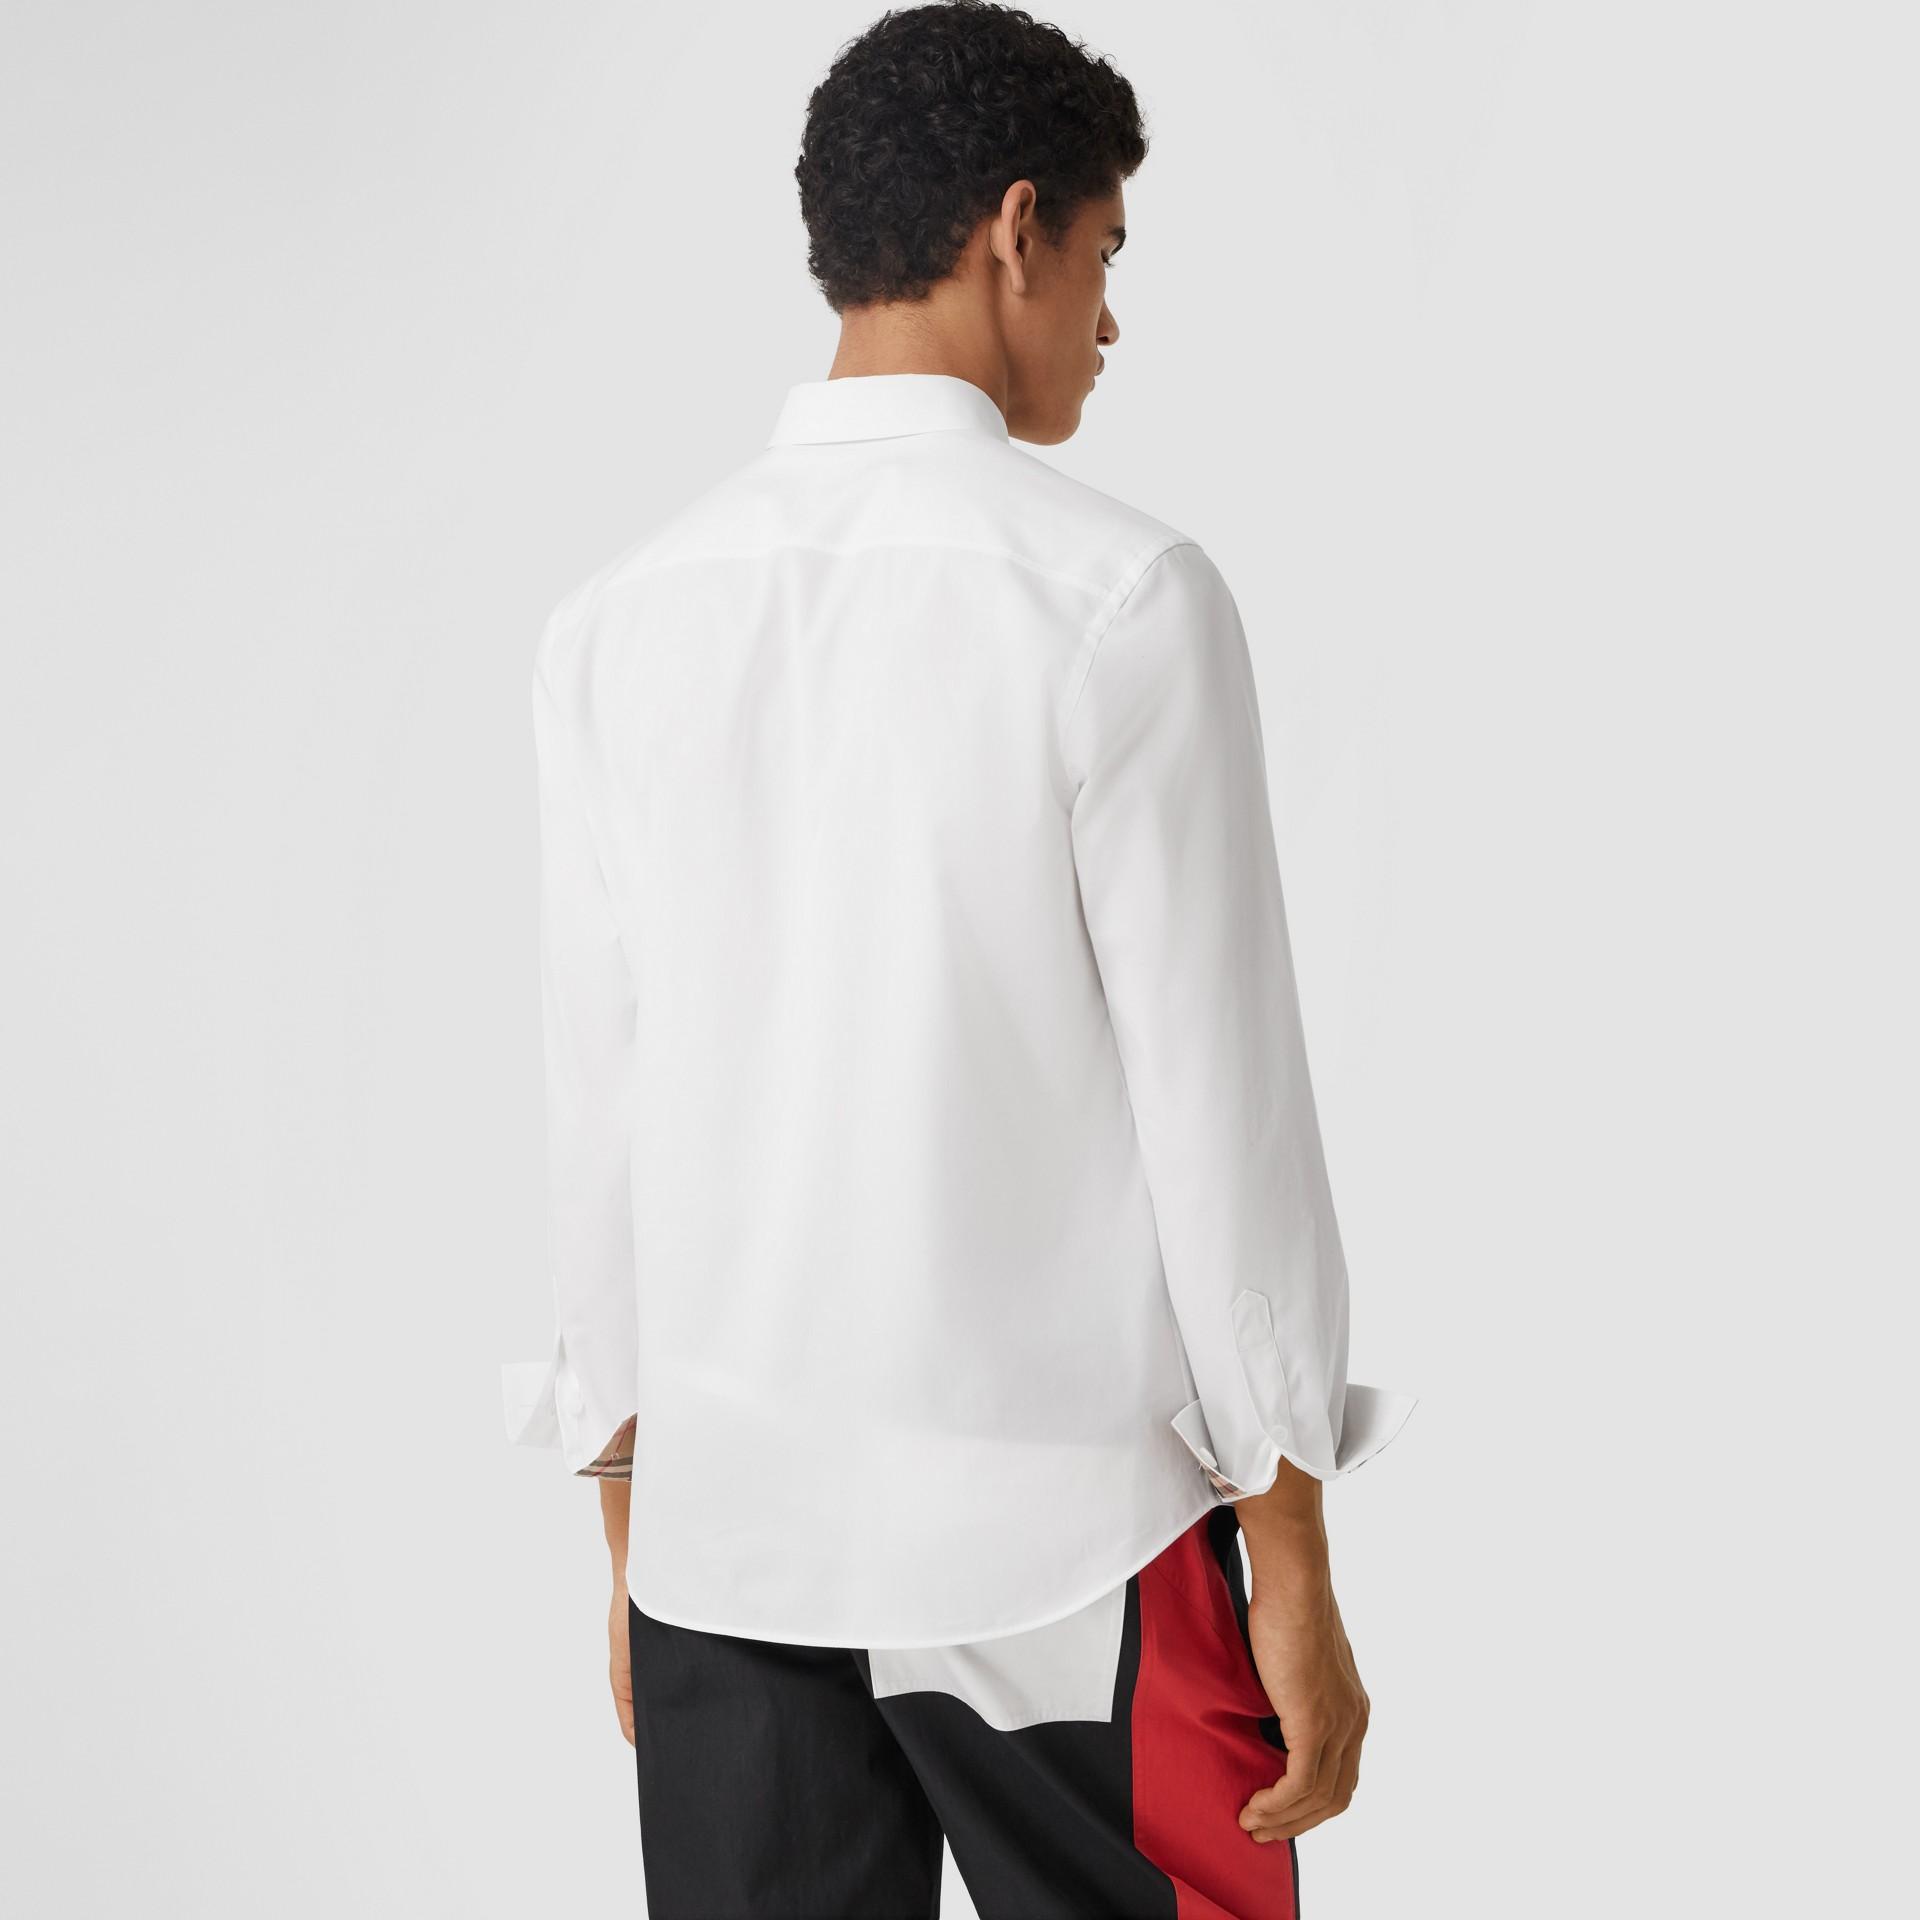 Slim Fit Monogram Motif Stretch Cotton Poplin Shirt in White - Men | Burberry United States - gallery image 2